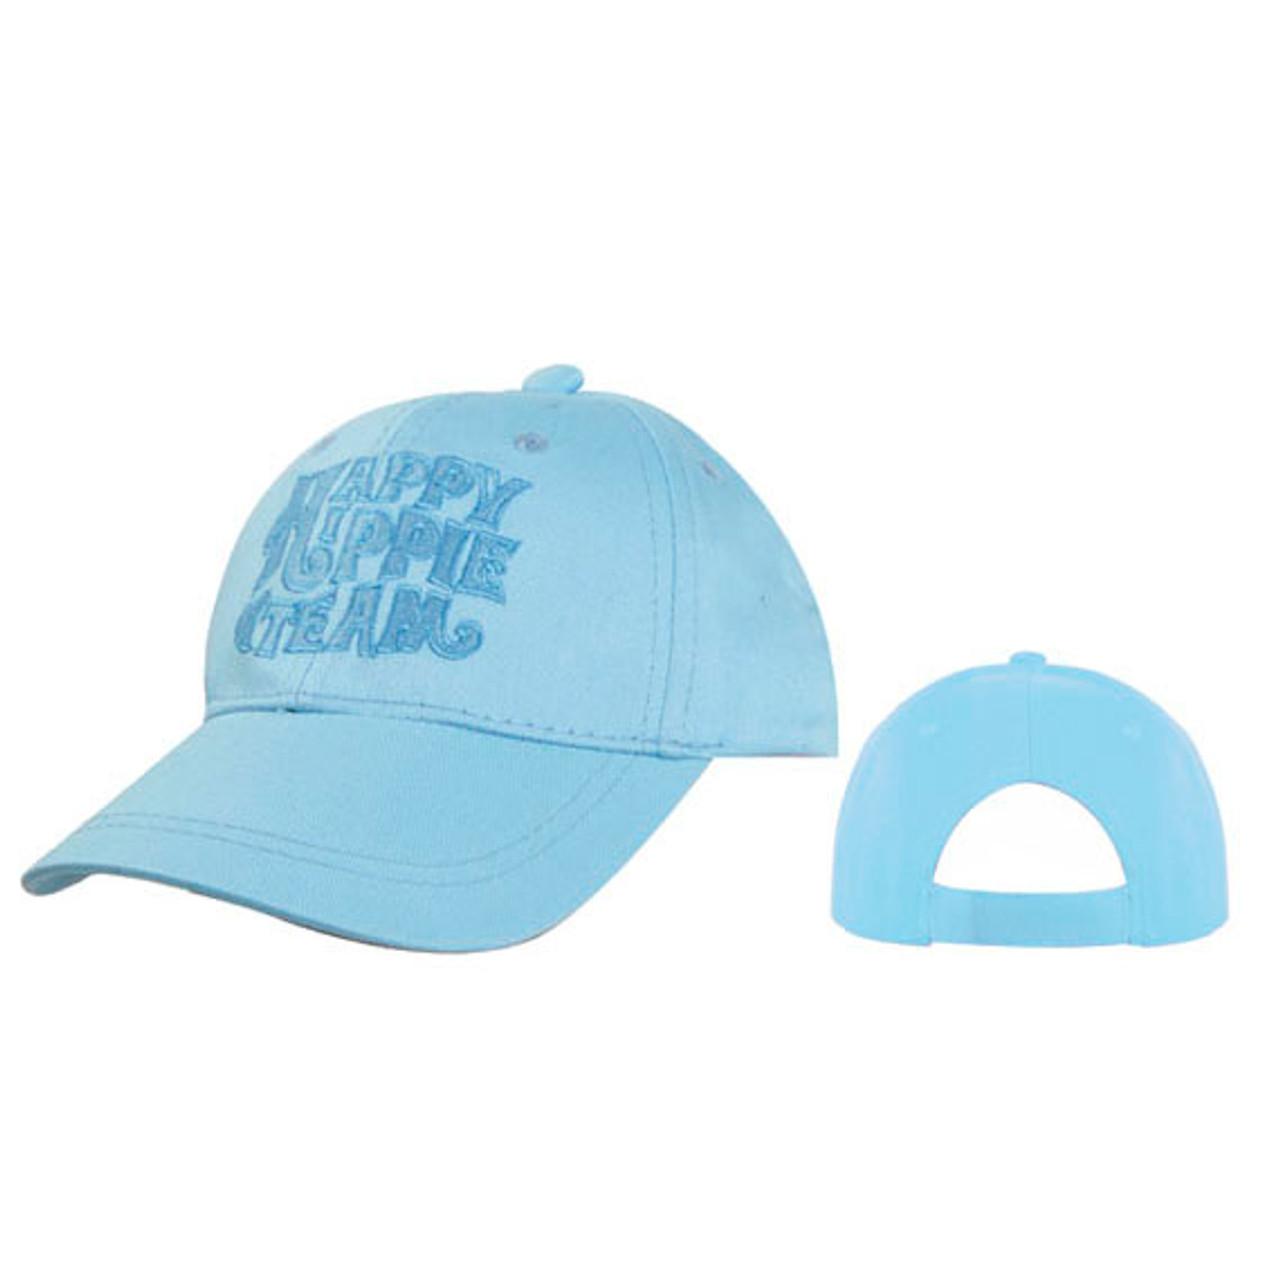 "Wholesale Kids Junior Sized Baseball Cap ""HAPPY HIPPIE TEAM"" C5225 (1 pc.)"